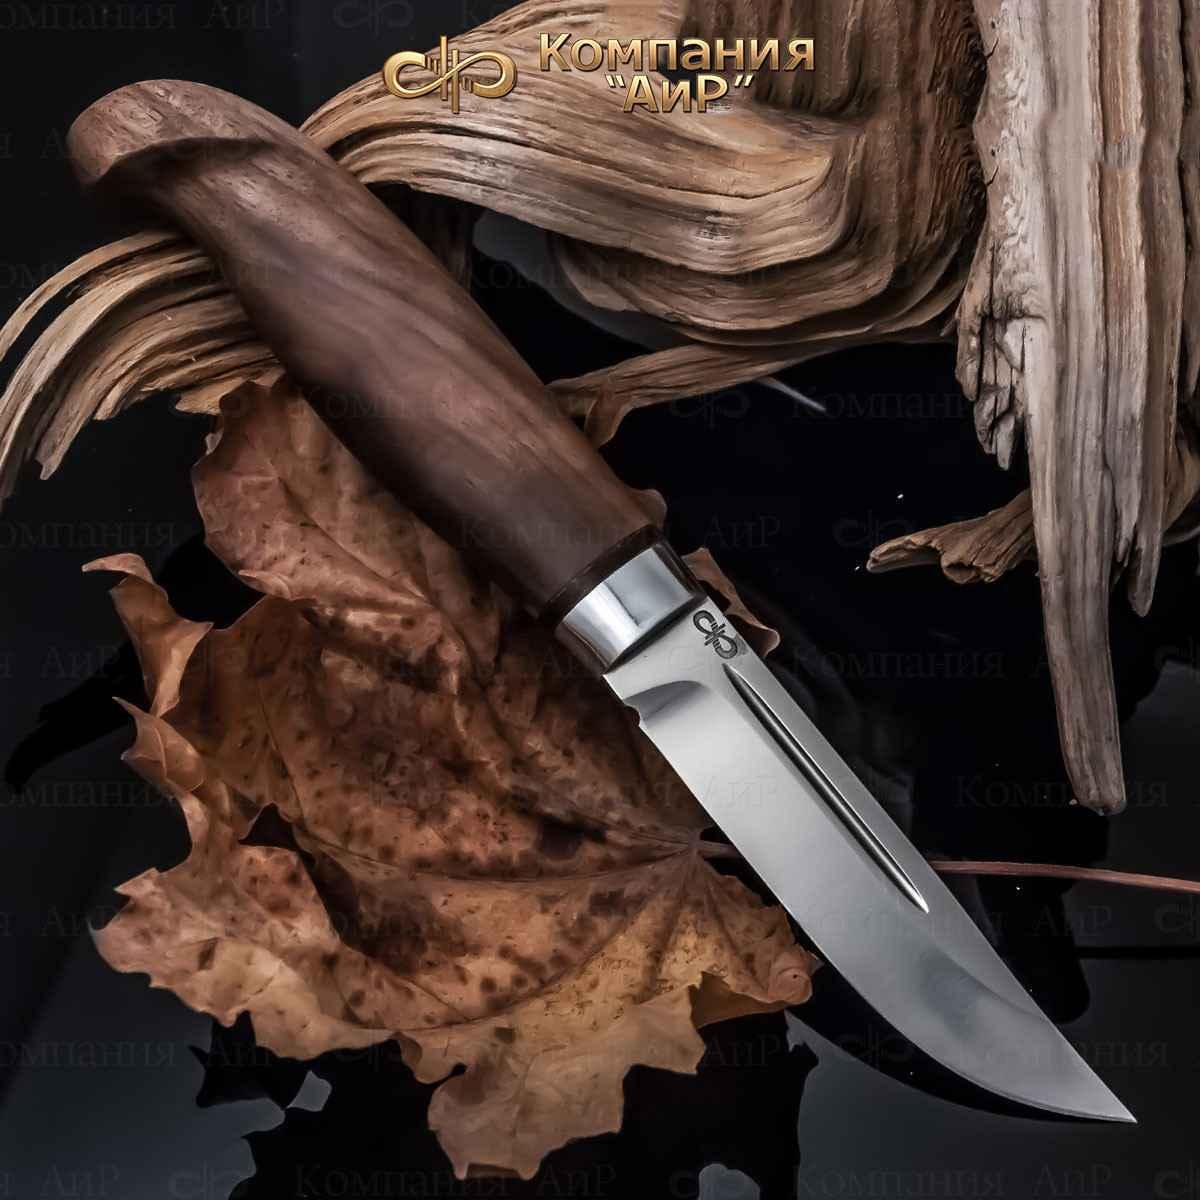 Нож АиР Финка Лаппи, сталь 110х18 М-ШД, рукоять дерево